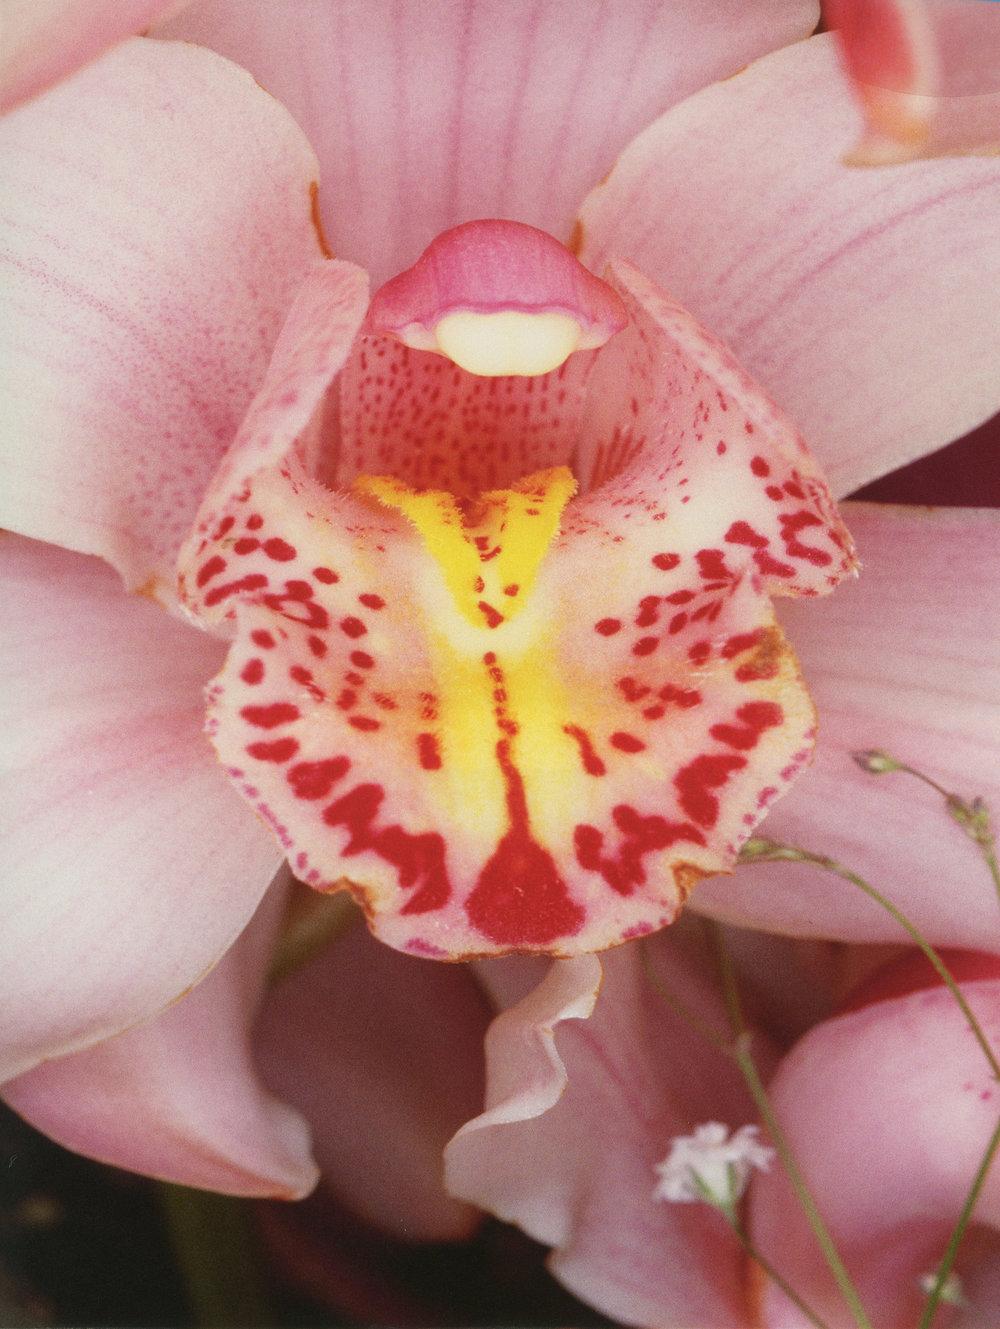 © Nobuyoshi Araki, Flowers, 1985  Courtesy of Private Collection.